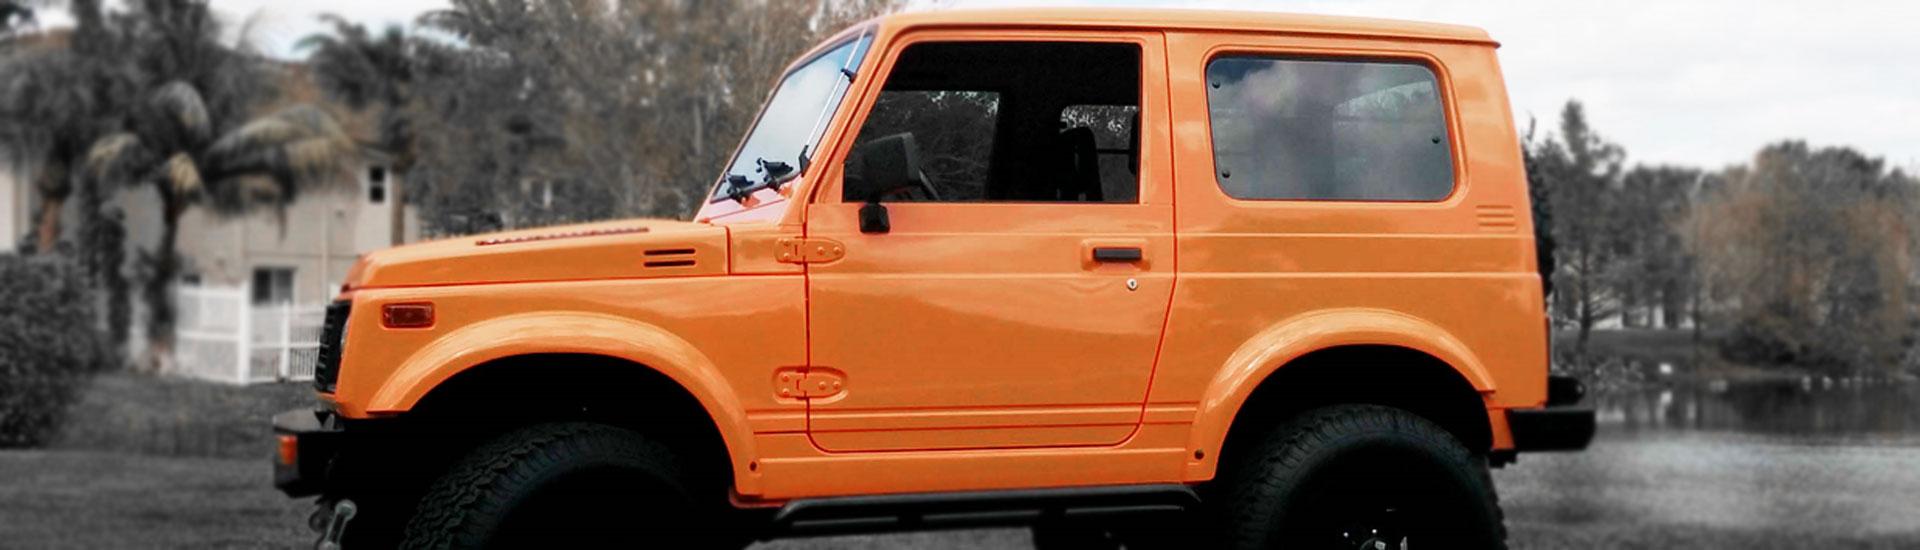 Suzuki Samurai Window Tint Kit Diy Precut Suzuki Samurai Window Tint